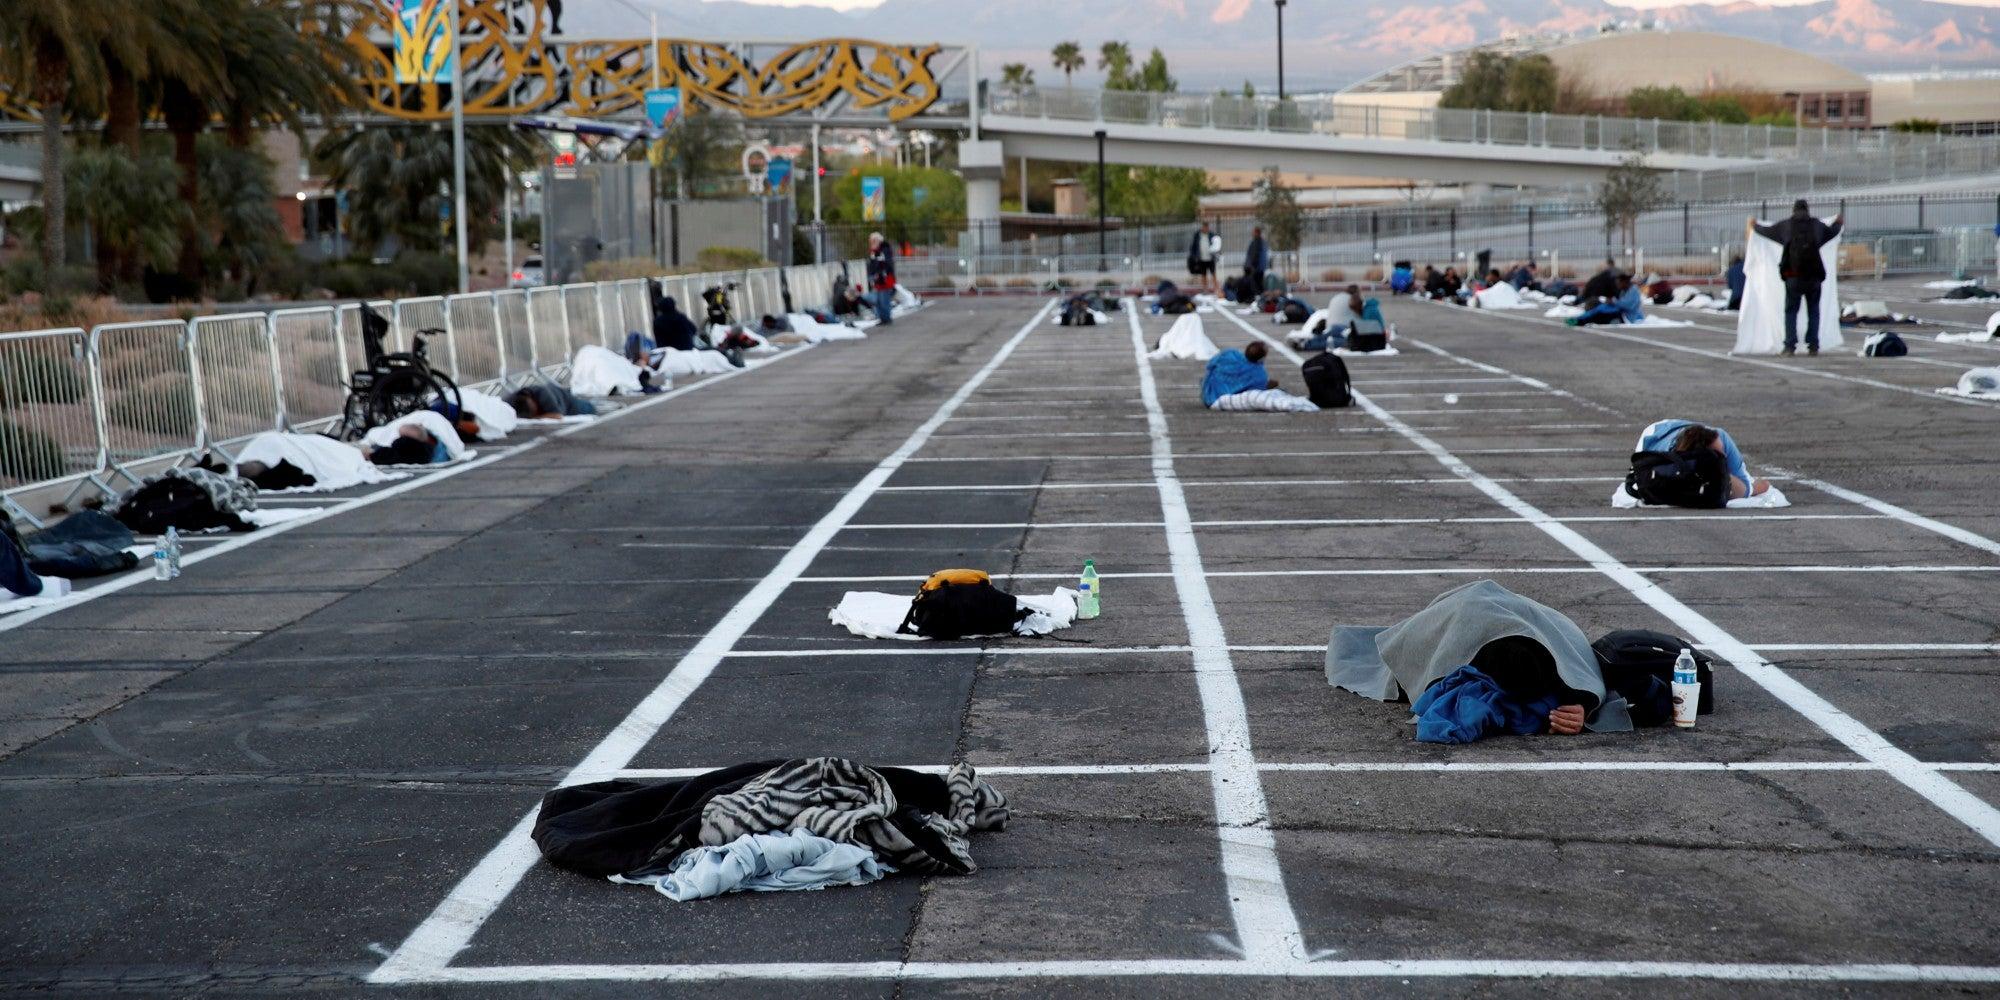 Homeless people in Las Vegas sleep 6 feet apart in parking lot as thousands of hotel rooms sit empty